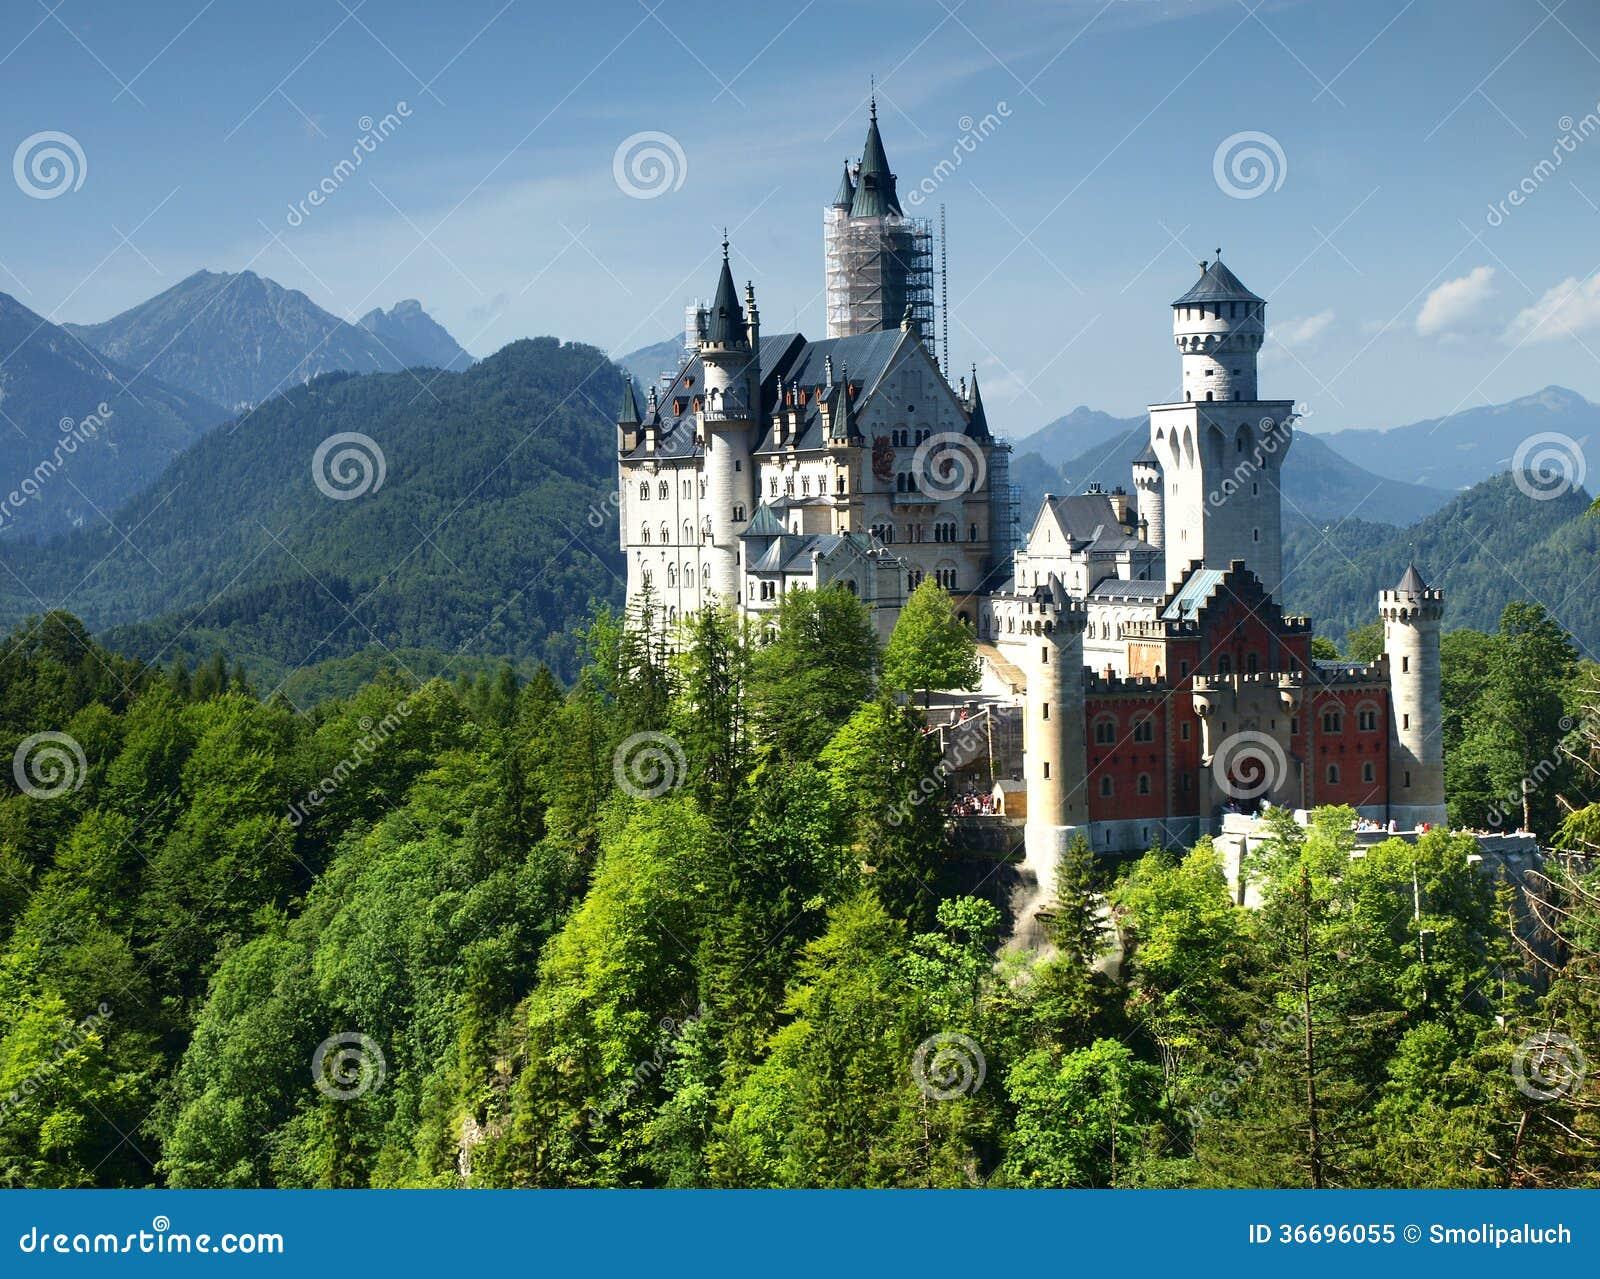 neuschwanstein castle in bavarian alps germany royalty